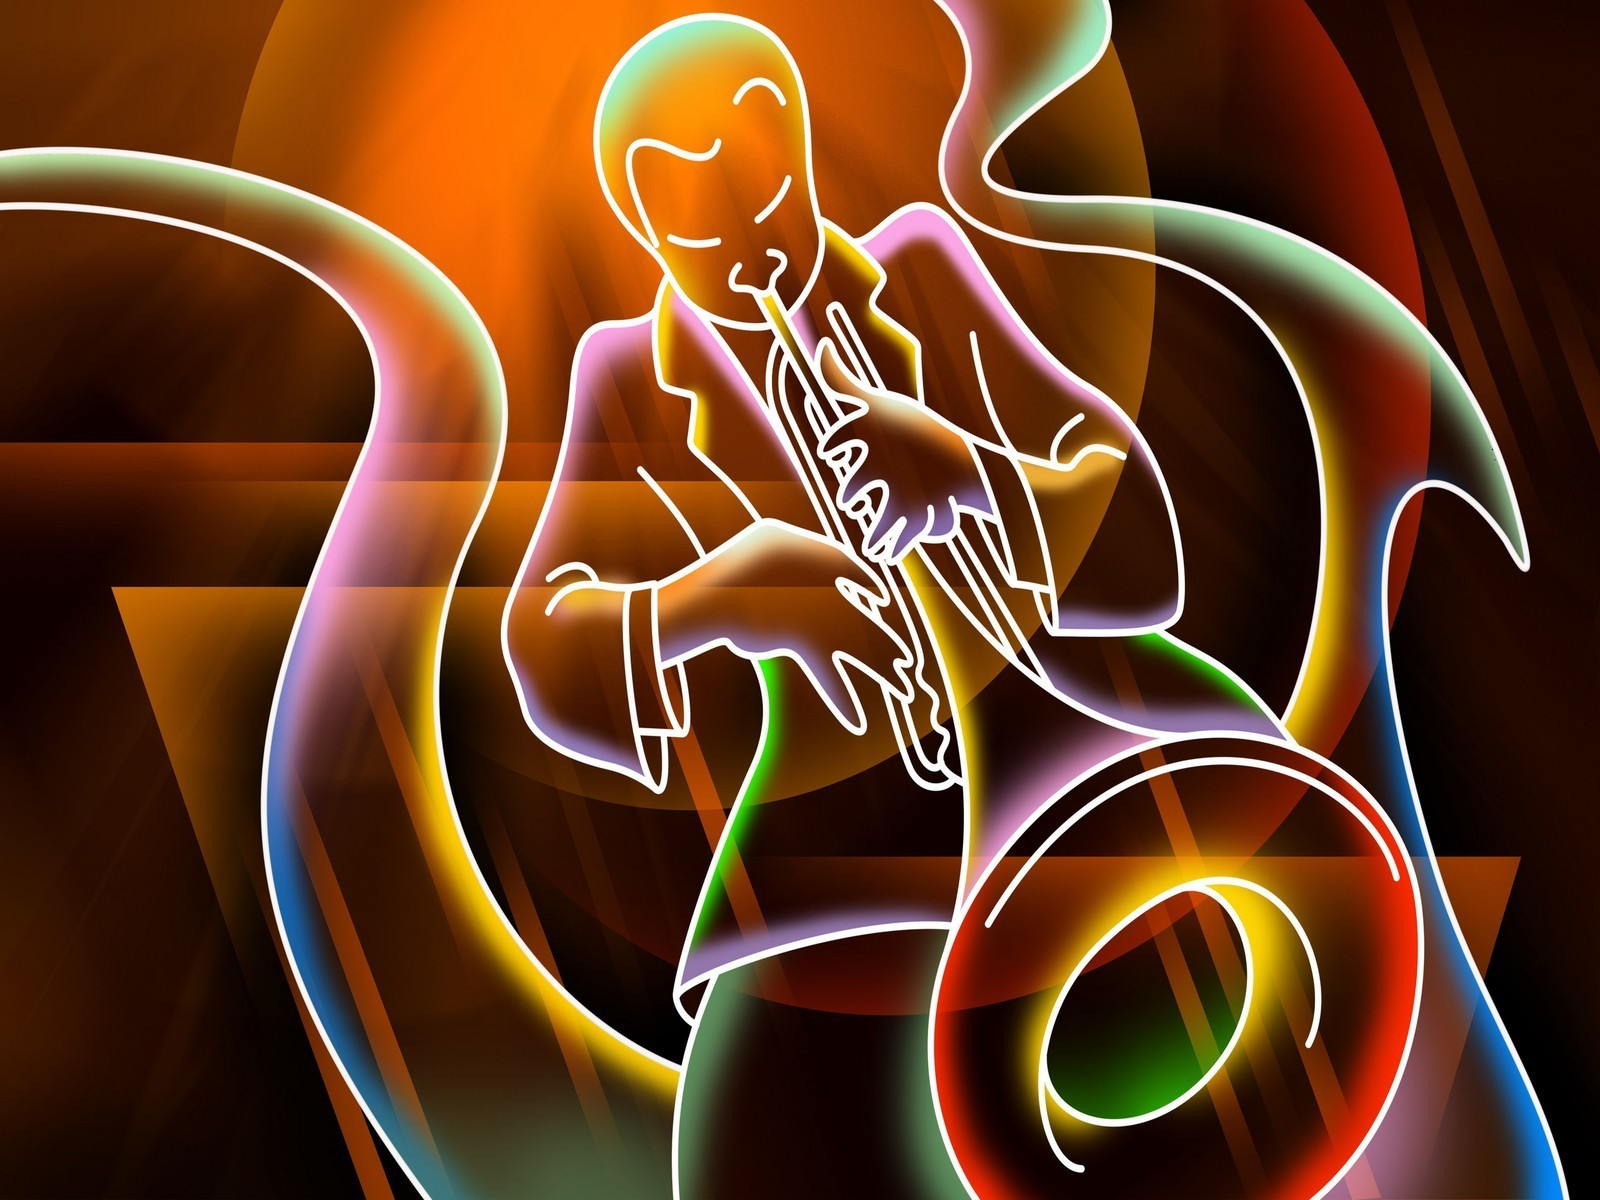 3d Jazz Music Wallpapers: Smooth Jazz Wallpaper